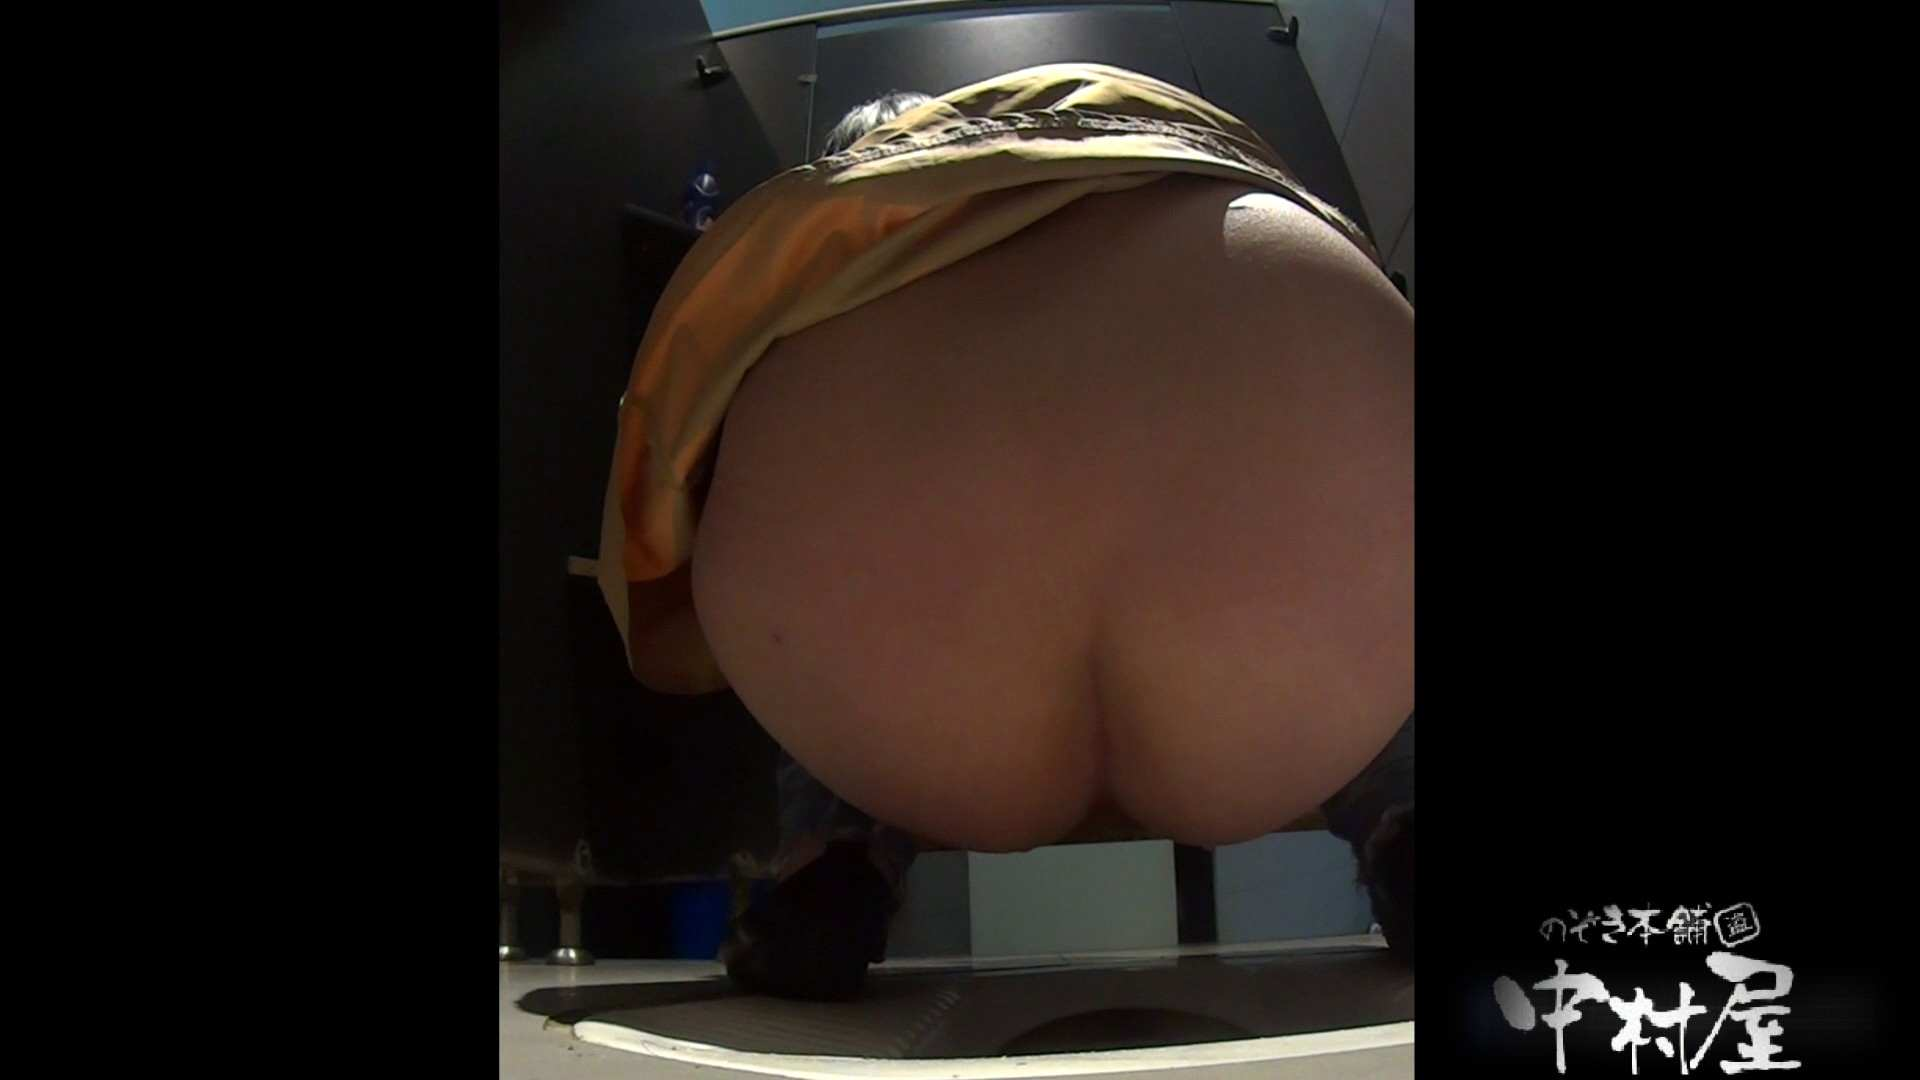 大学休憩時間の洗面所事情22 美女ハメ撮り  81Pix 64